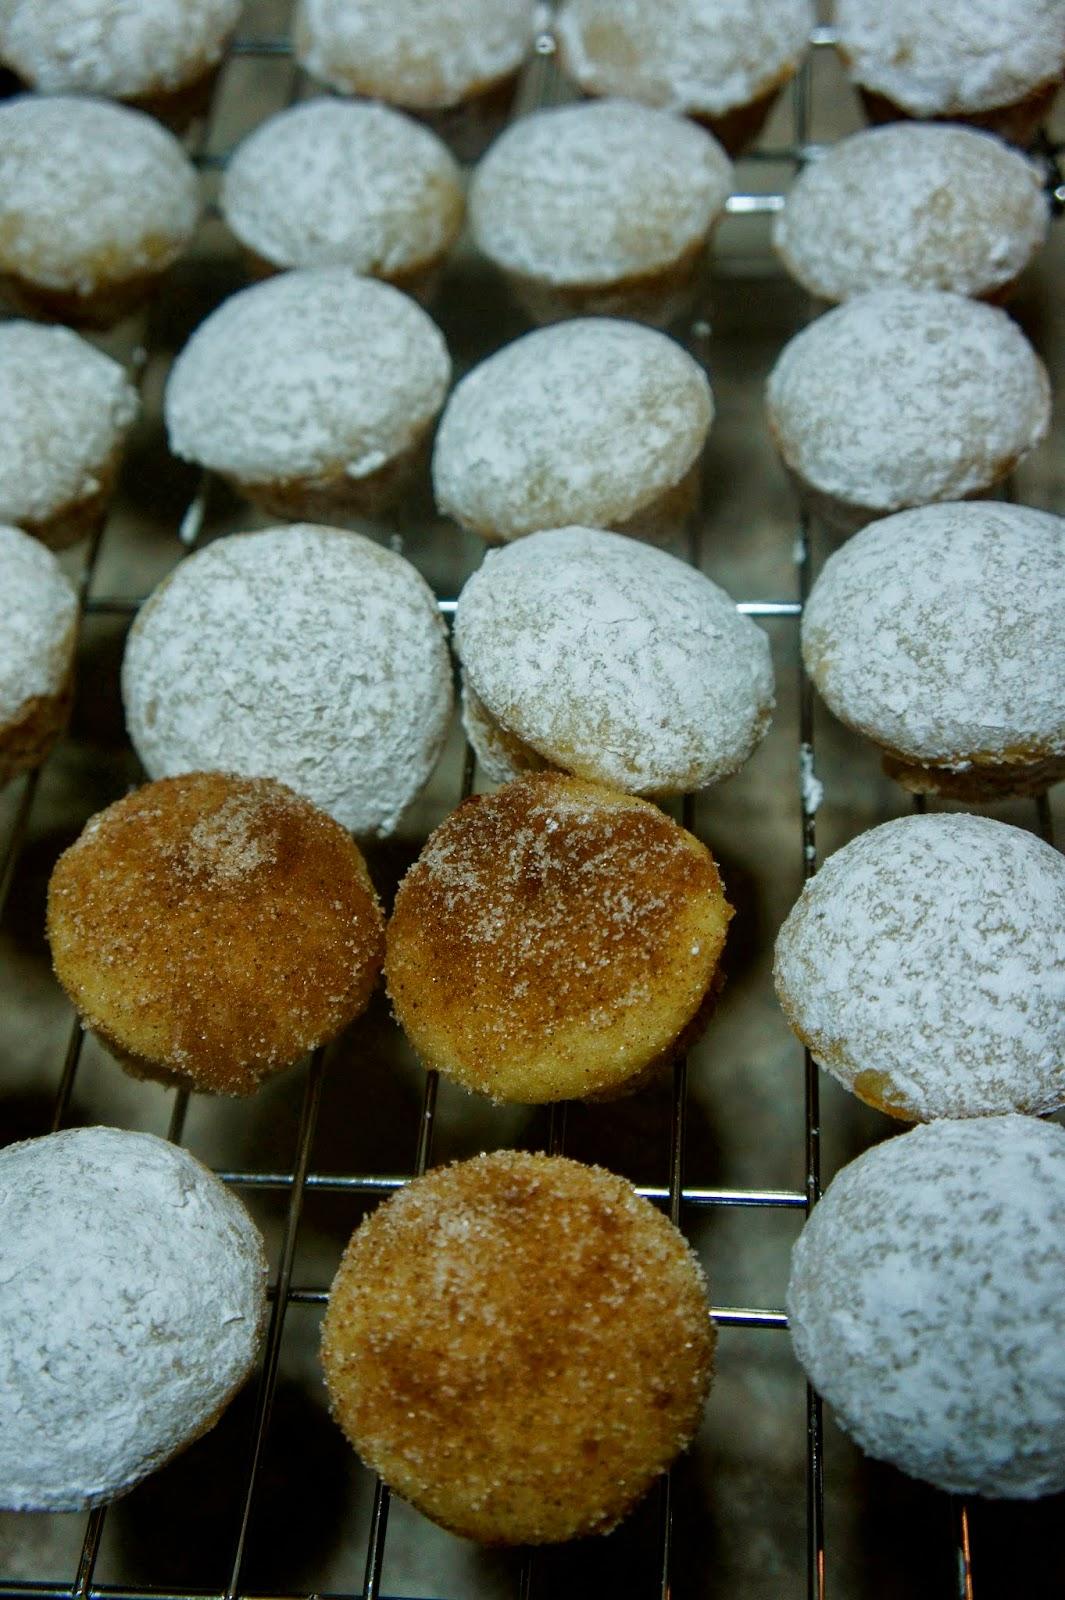 Baked Cake Doughnuts: Savory Sweet and Satisfying